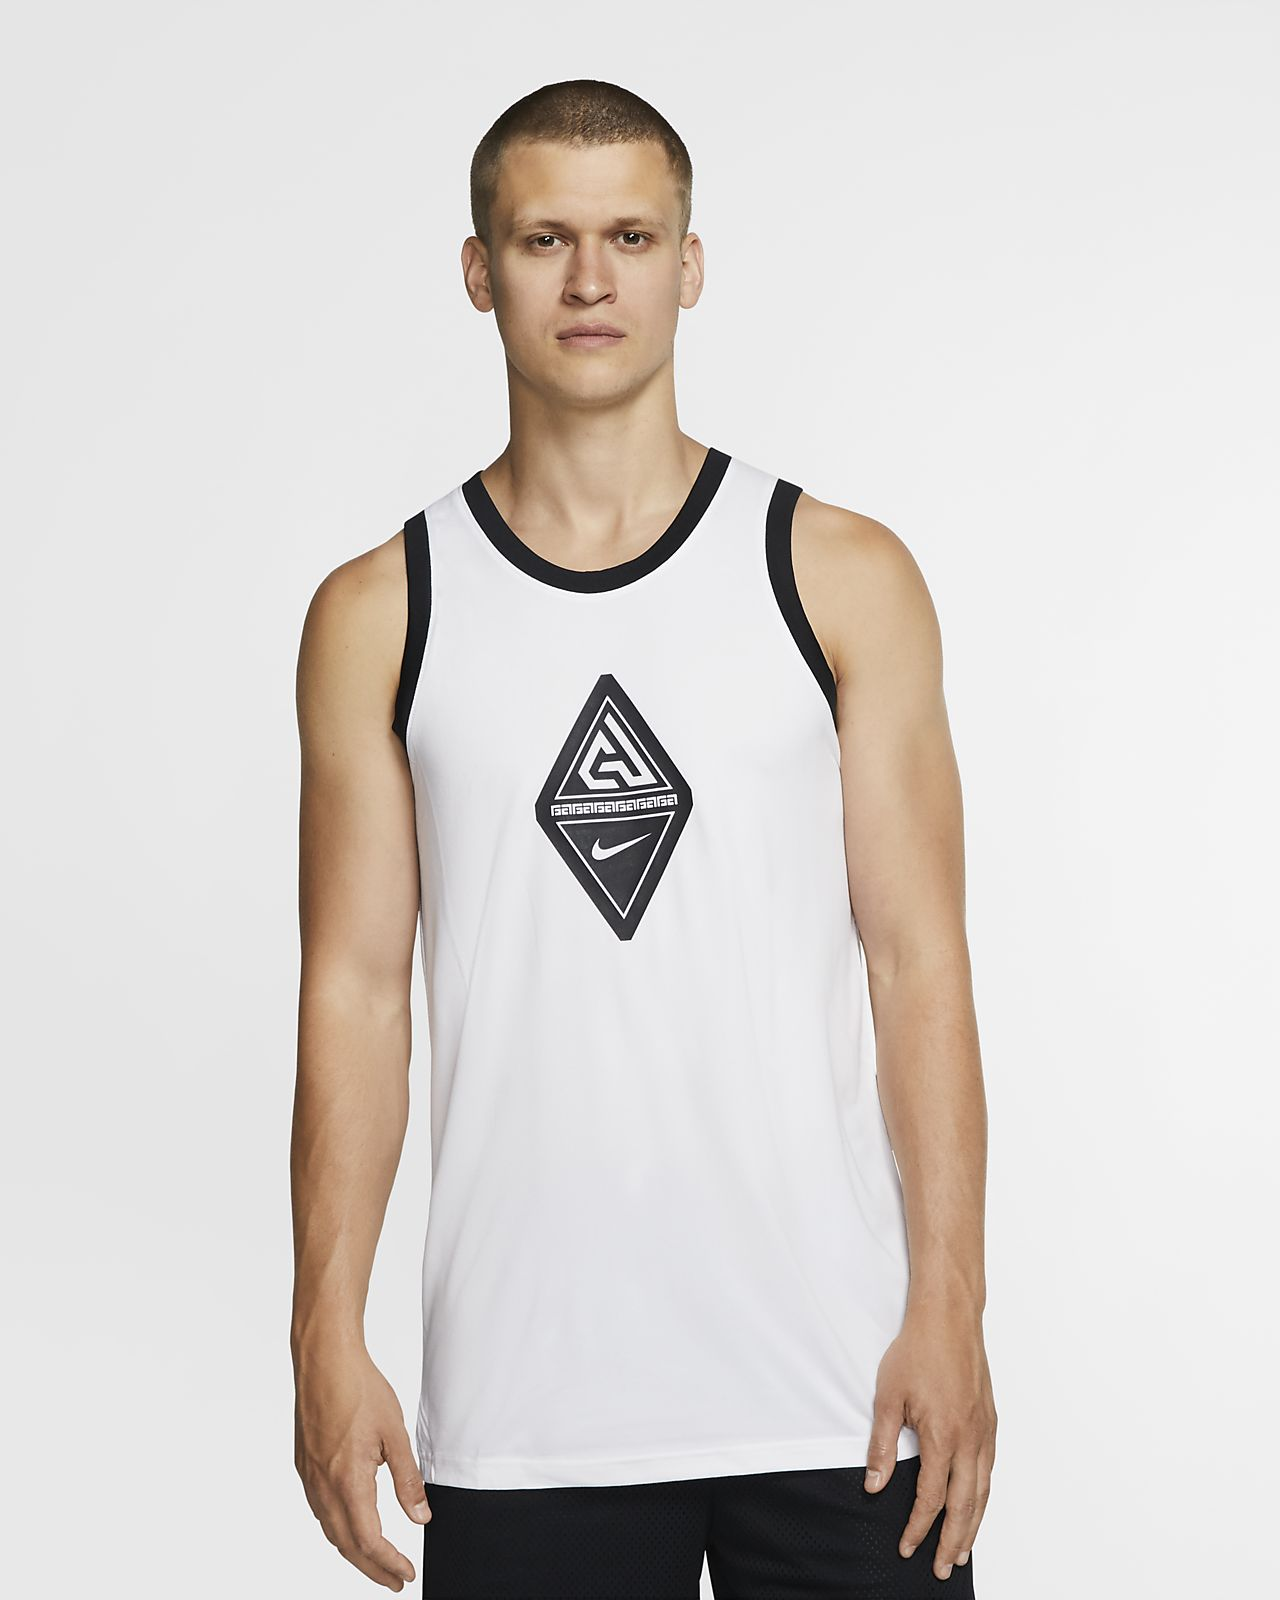 Męska koszulka bez rękawów do koszykówki z logo Giannis